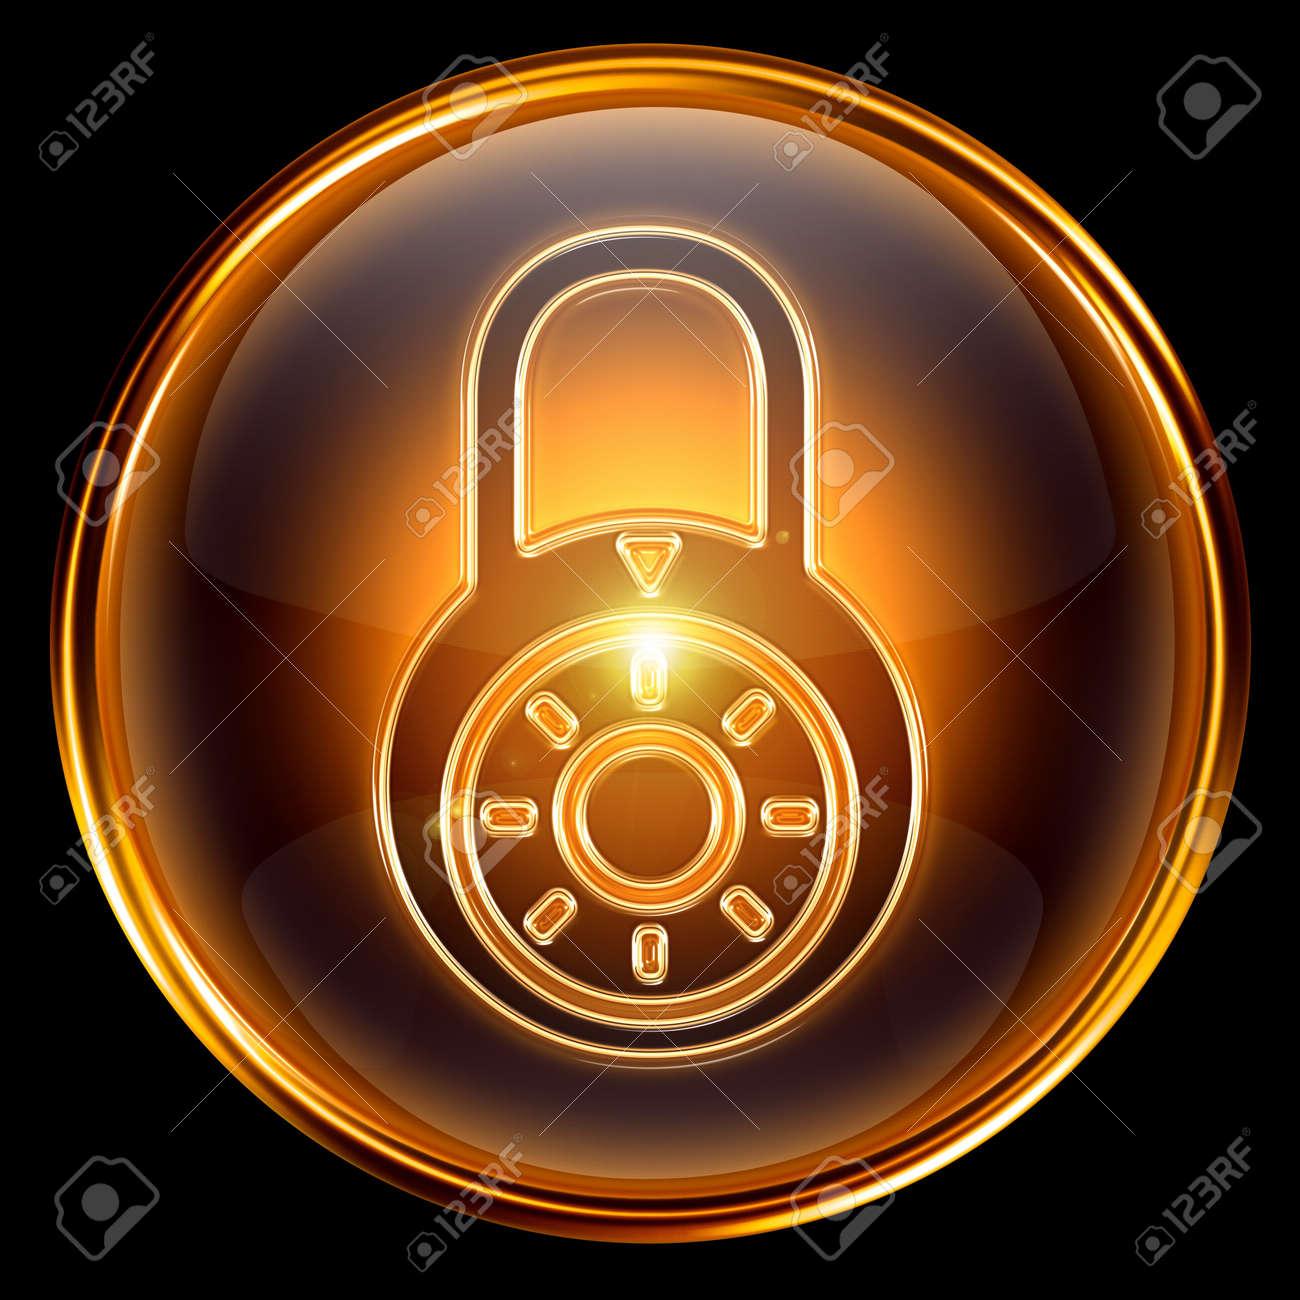 Lock closed icon gold, isolated on black background Stock Photo - 7204477